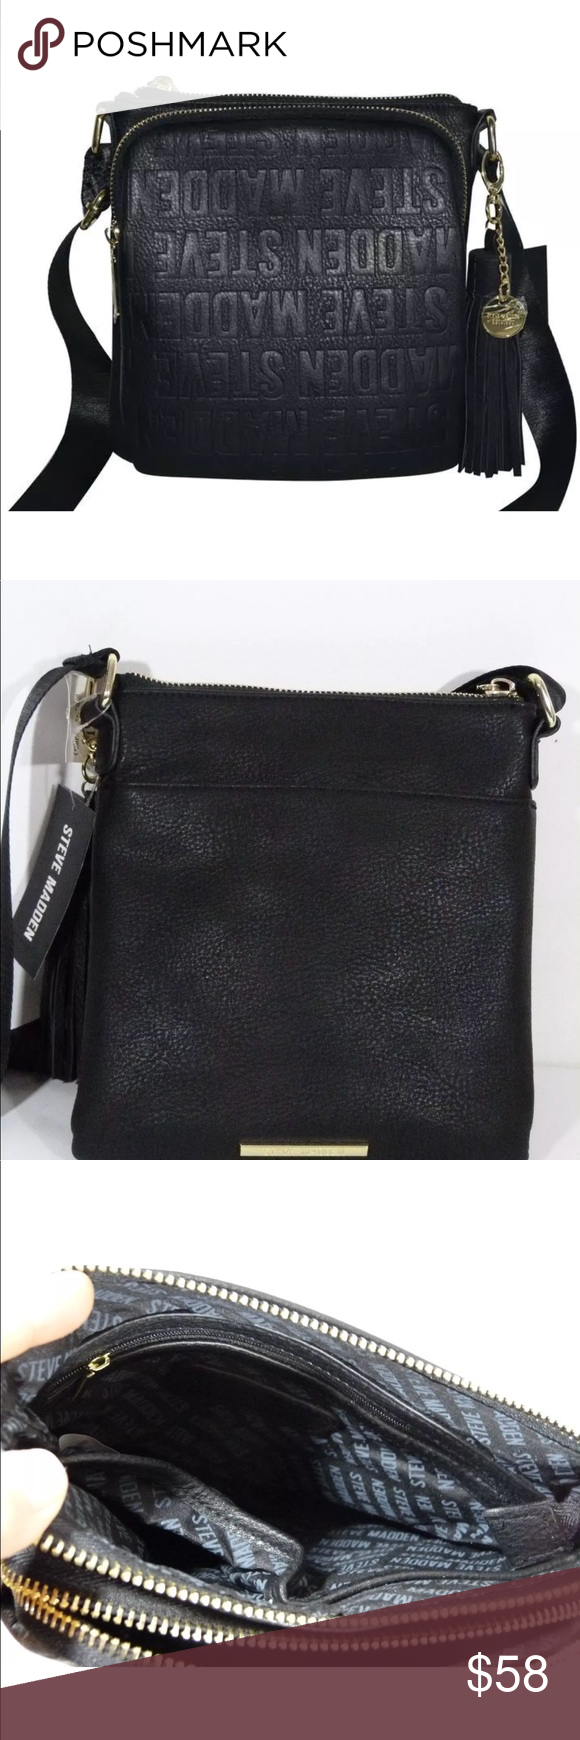 f0037caa90d Authentic Steve Madden BGLAM LOGO crossbody bag Steve Madden BGLAM LOGO  Black Crossbody Bag With detachable